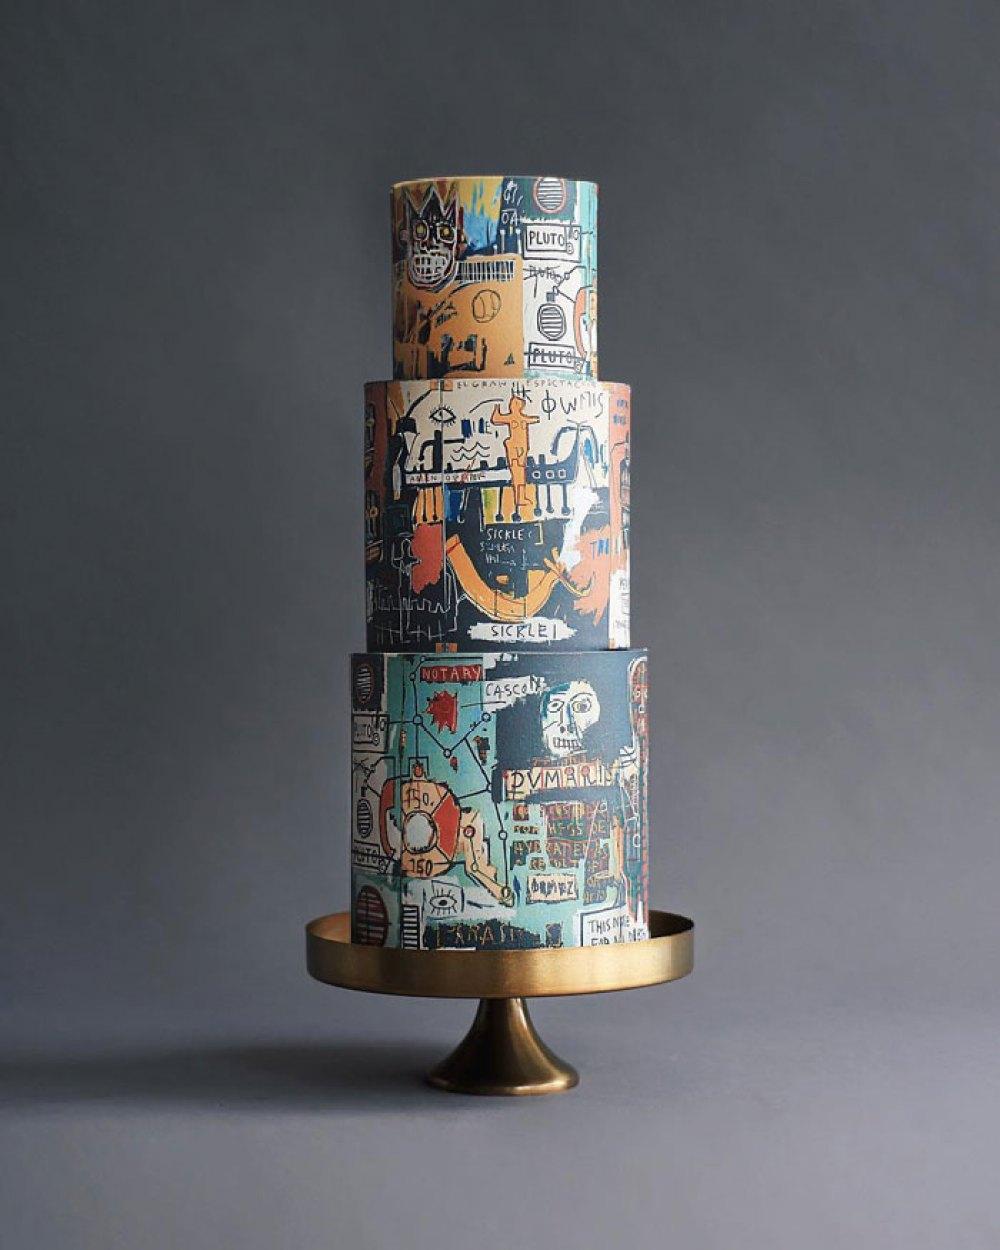 tortik-annushka-artistic-cakes-designs-20-5e82fdeaedf7e__700